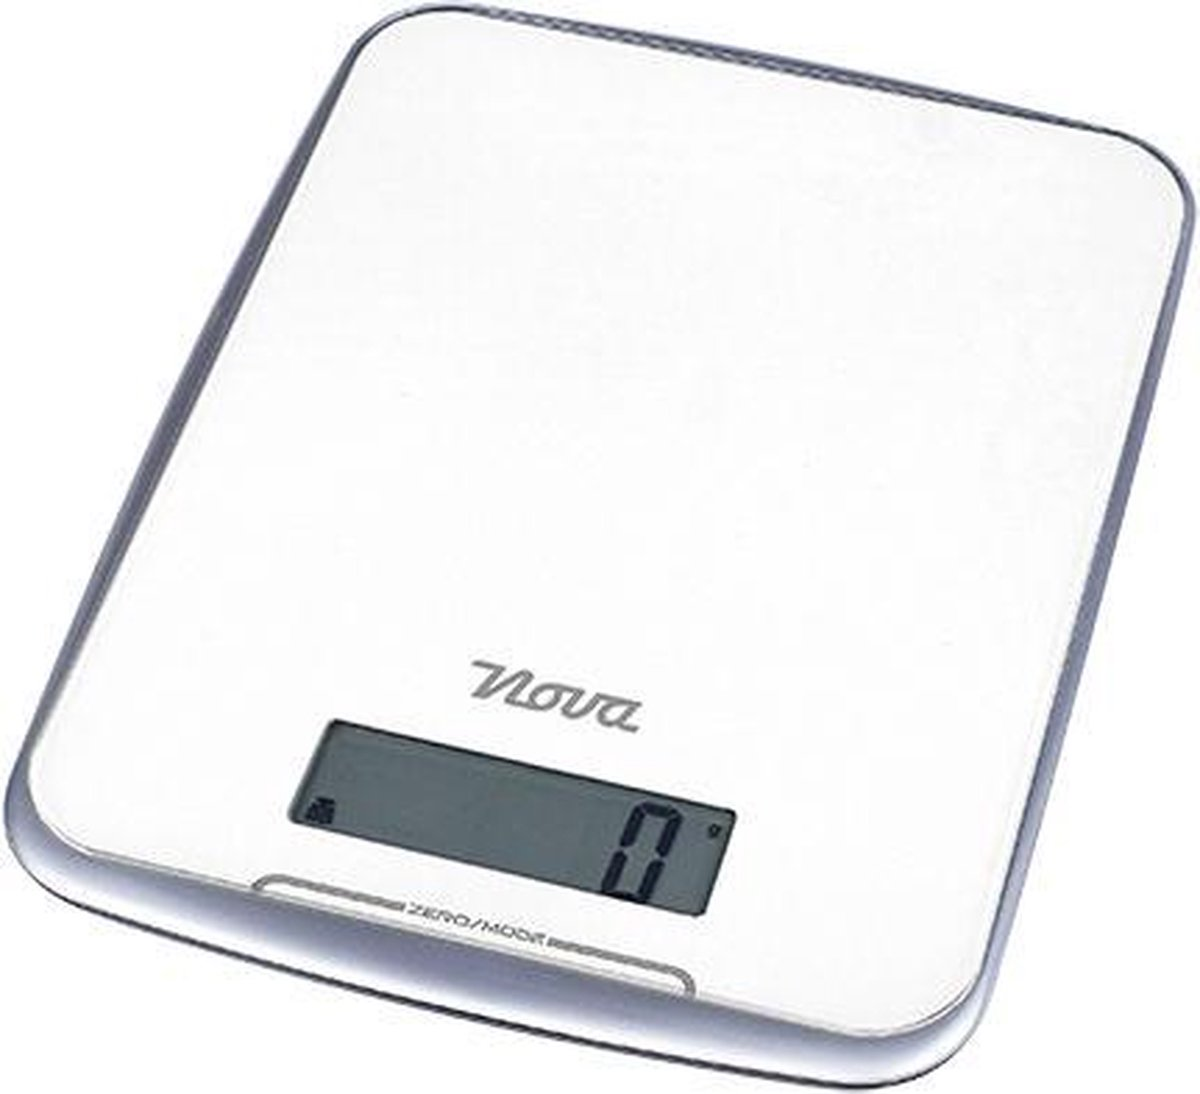 Nova, Keukenweegschaal - Tot 10 kg - Digitaal Display - Nova